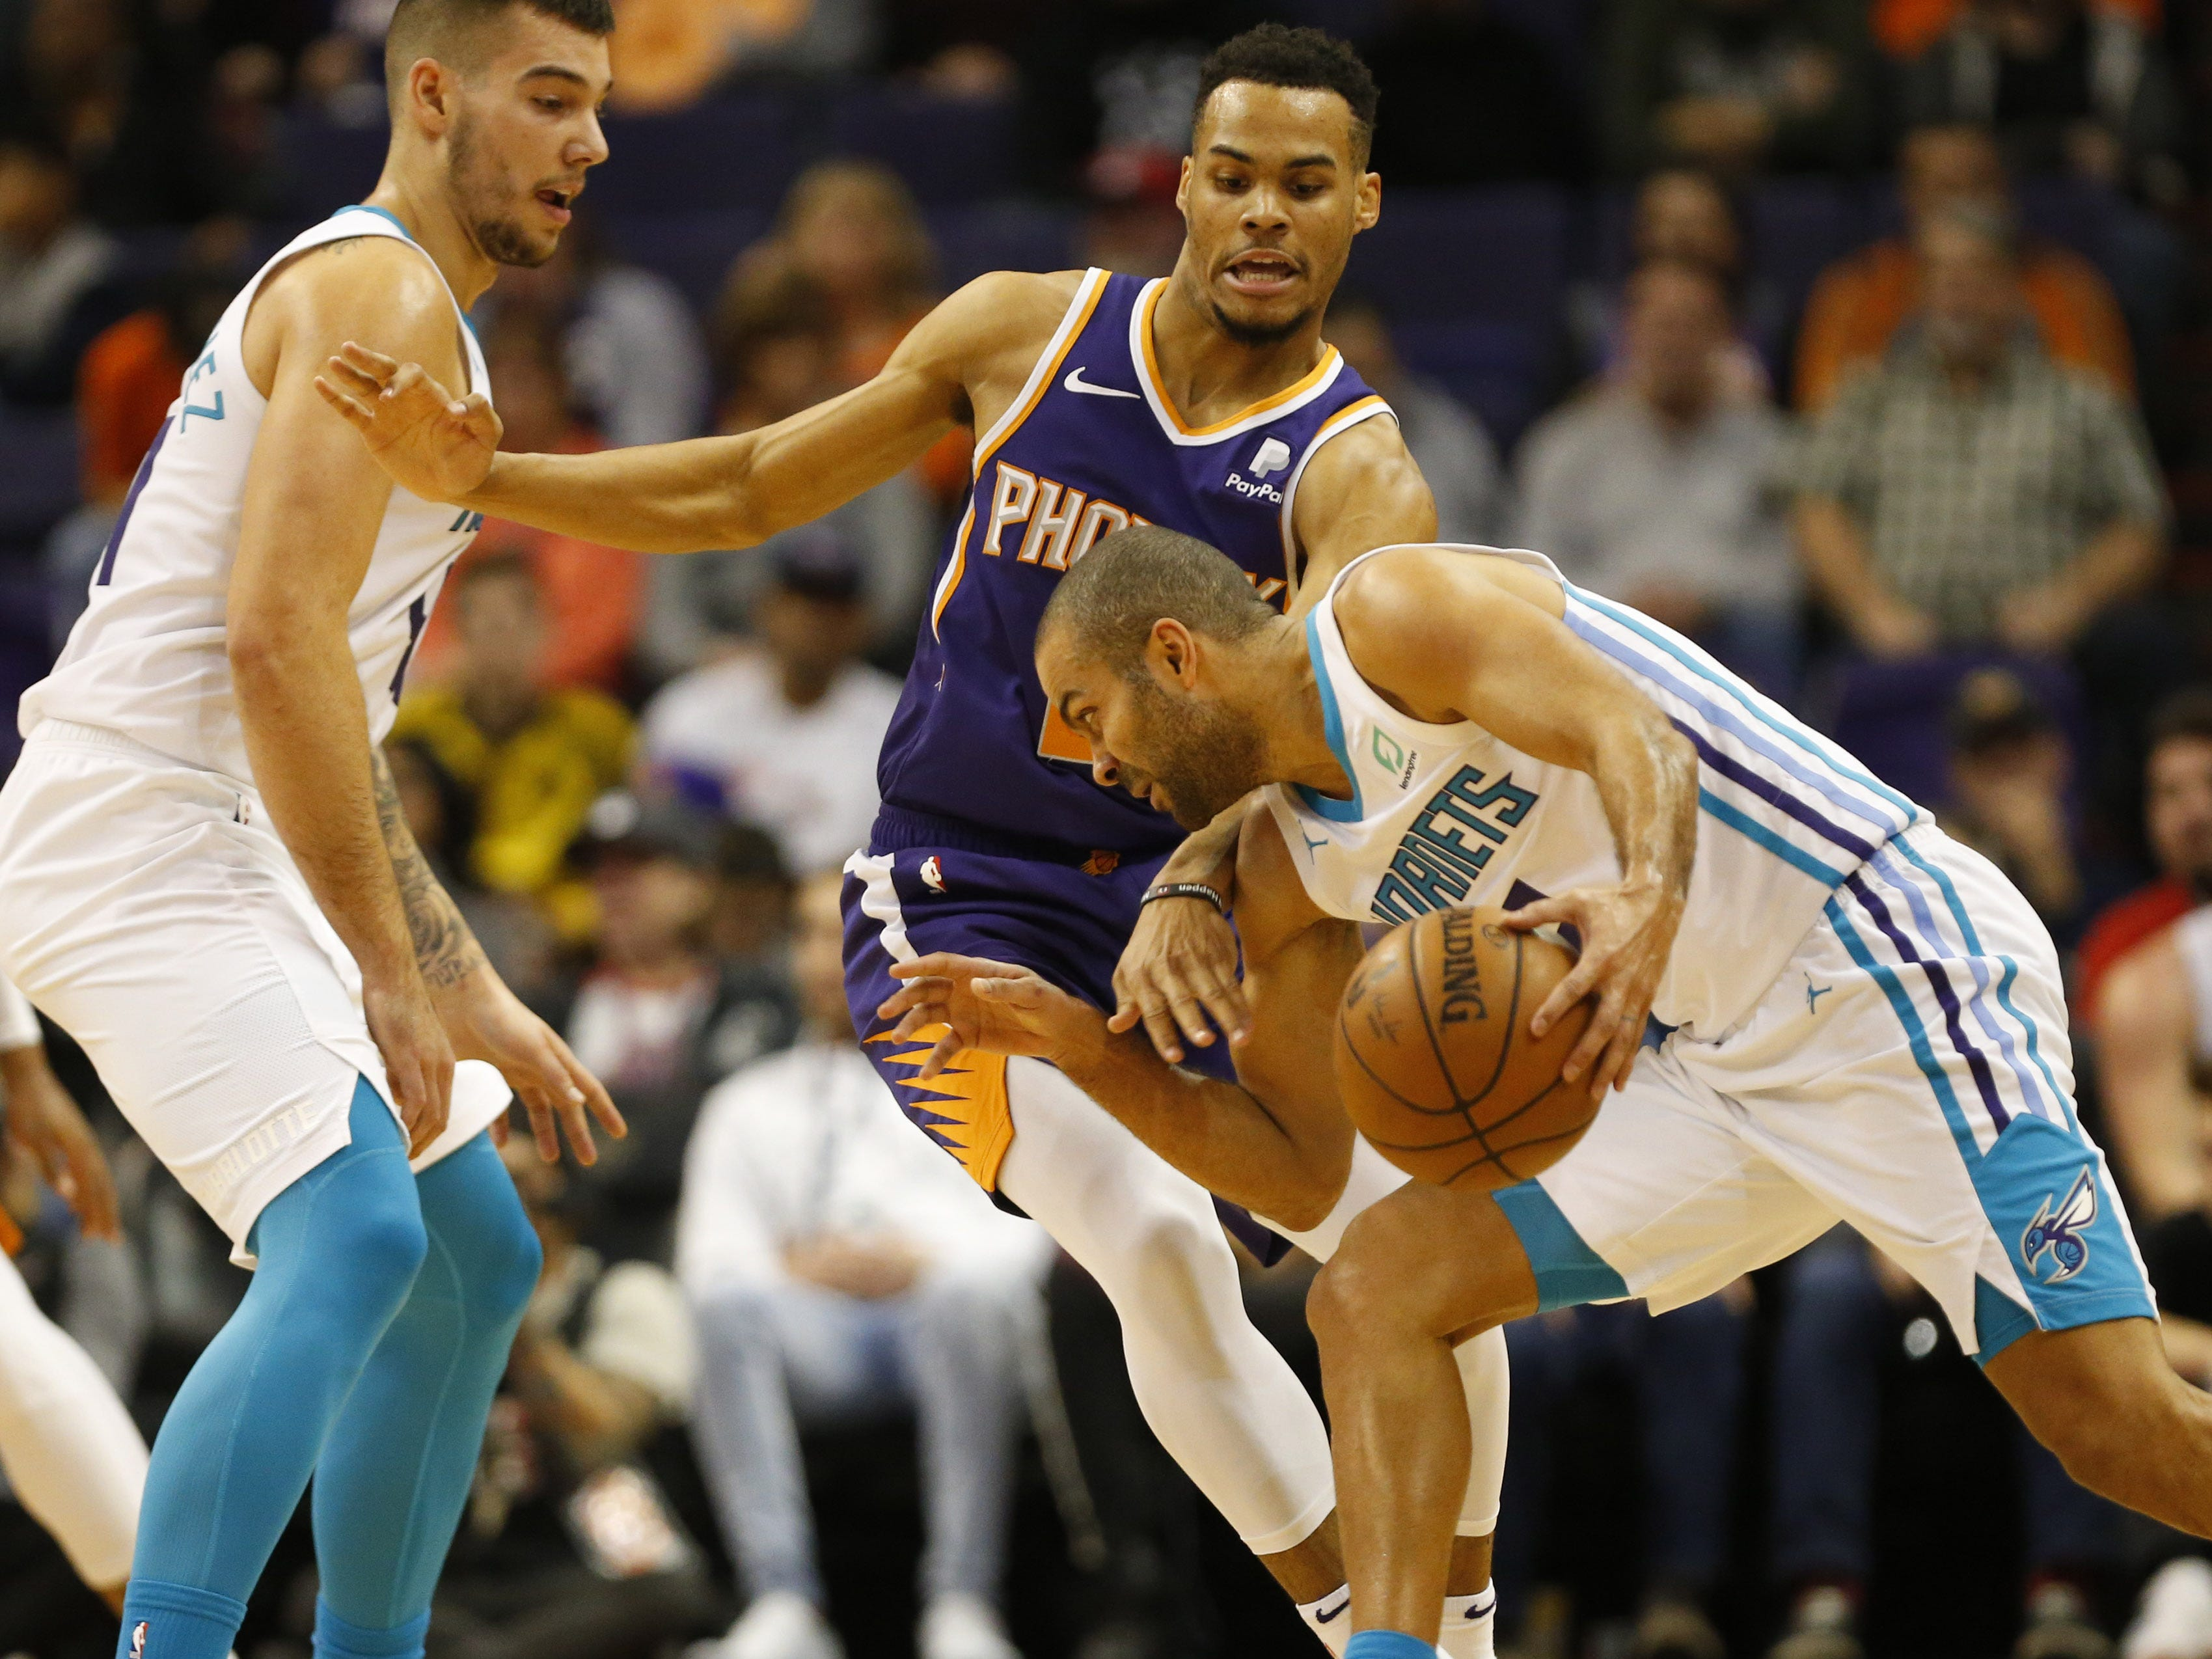 Phoenix Suns guard Elie Okobo (2) guards Charlotte Hornets guard Tony Parker (9) during the second quarter in Phoenix January 6, 2019.